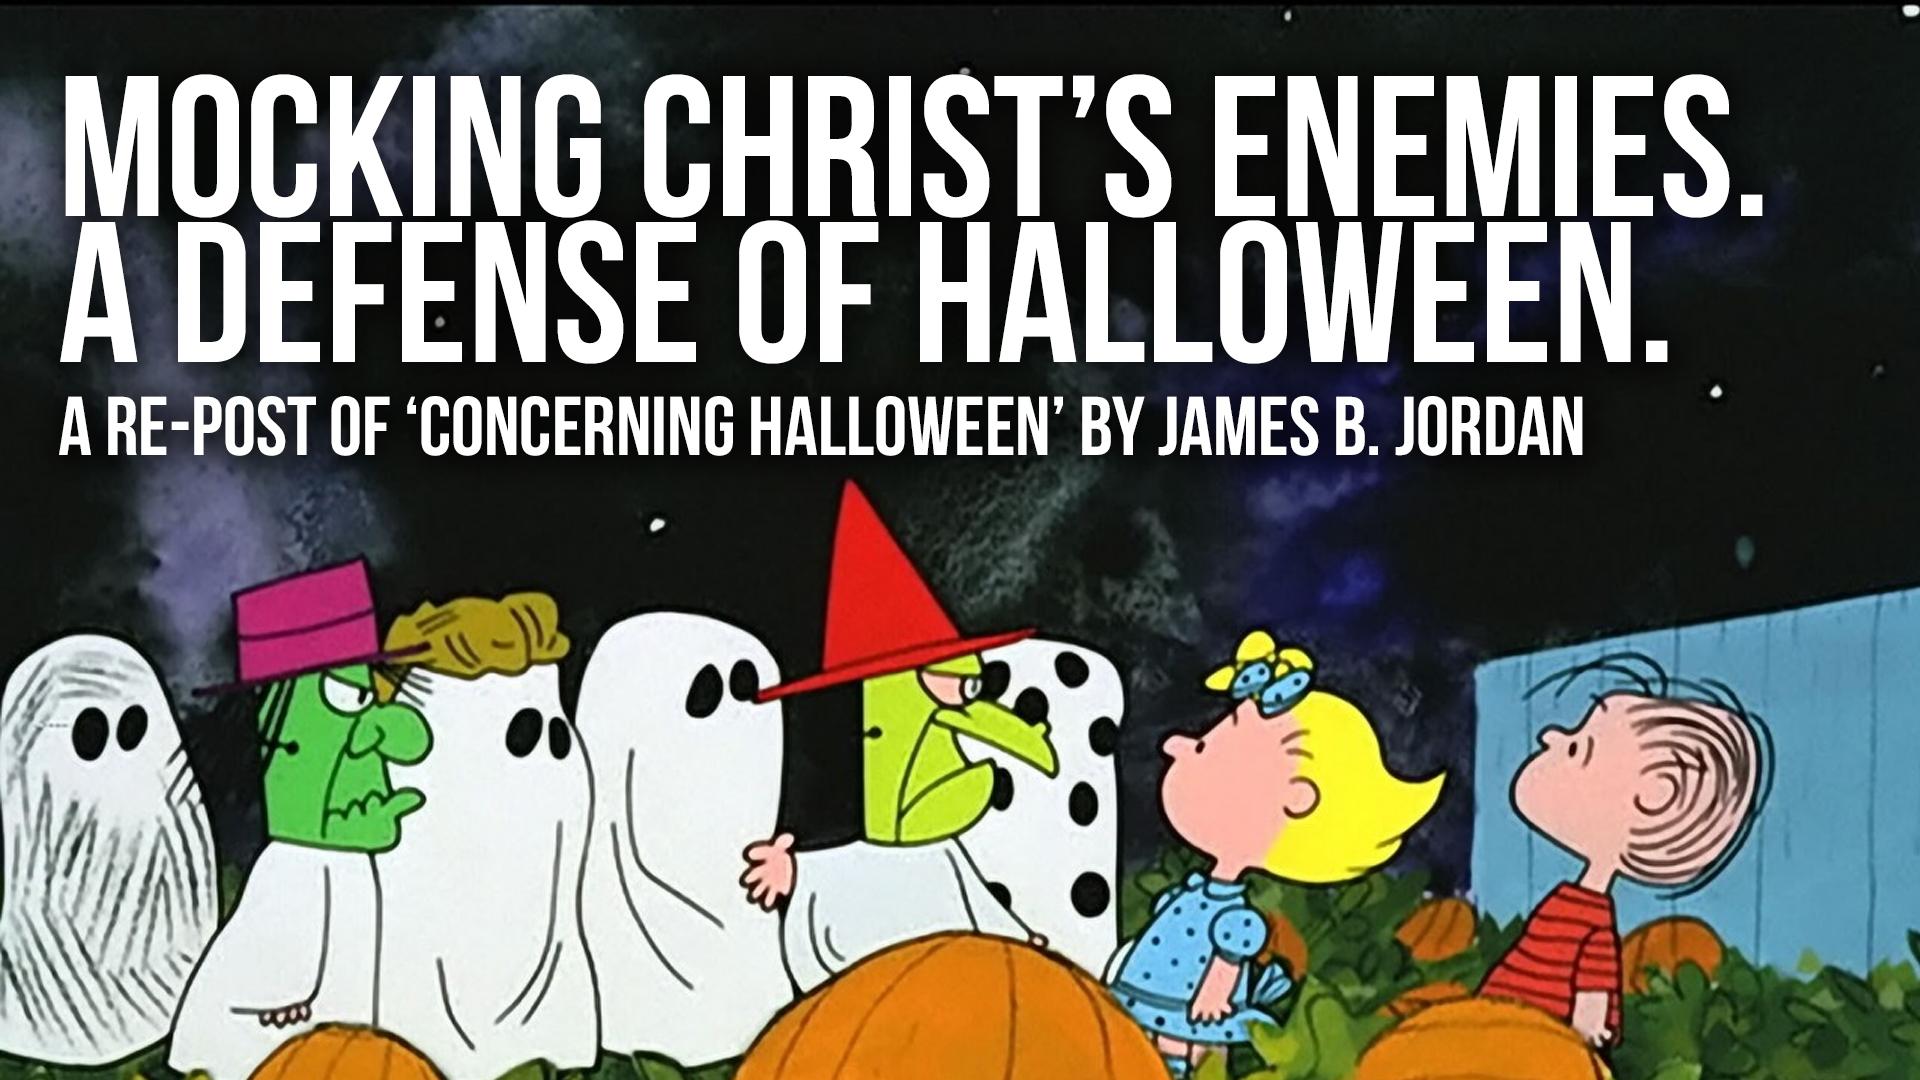 Mocking Christ's Enemies: A Defense of Halloween